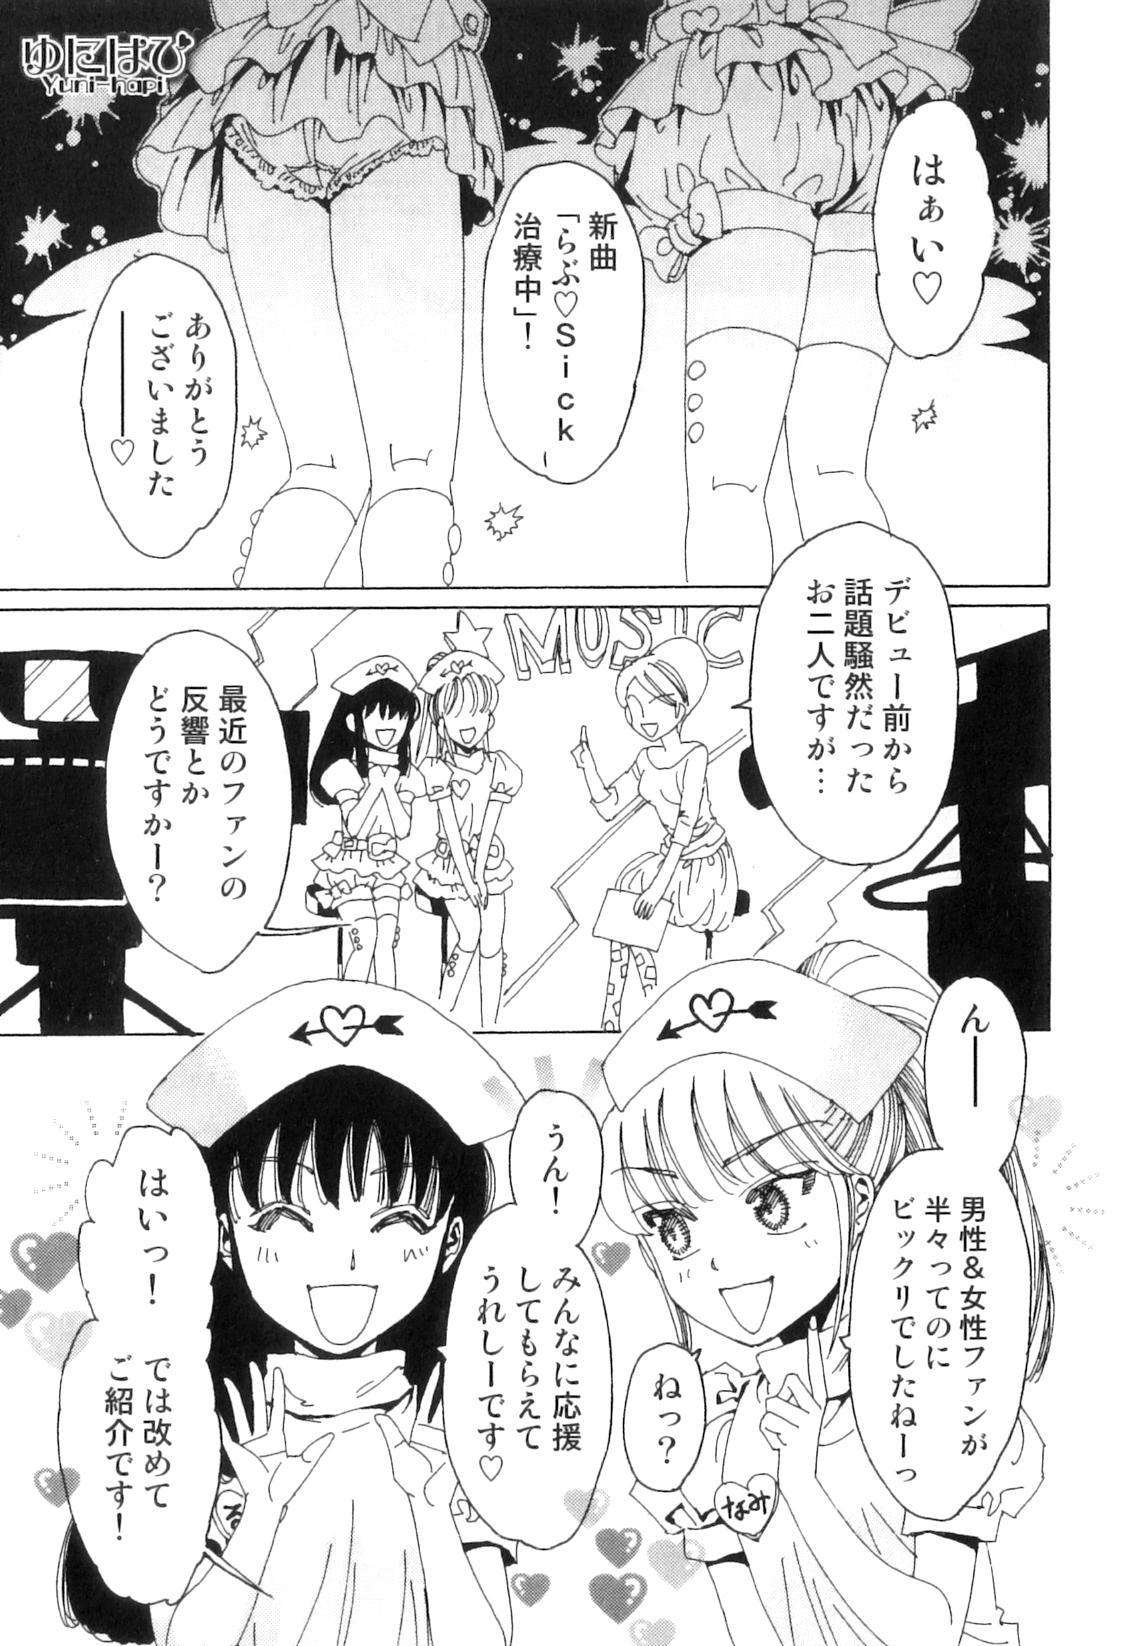 Yuni-Hapi 7